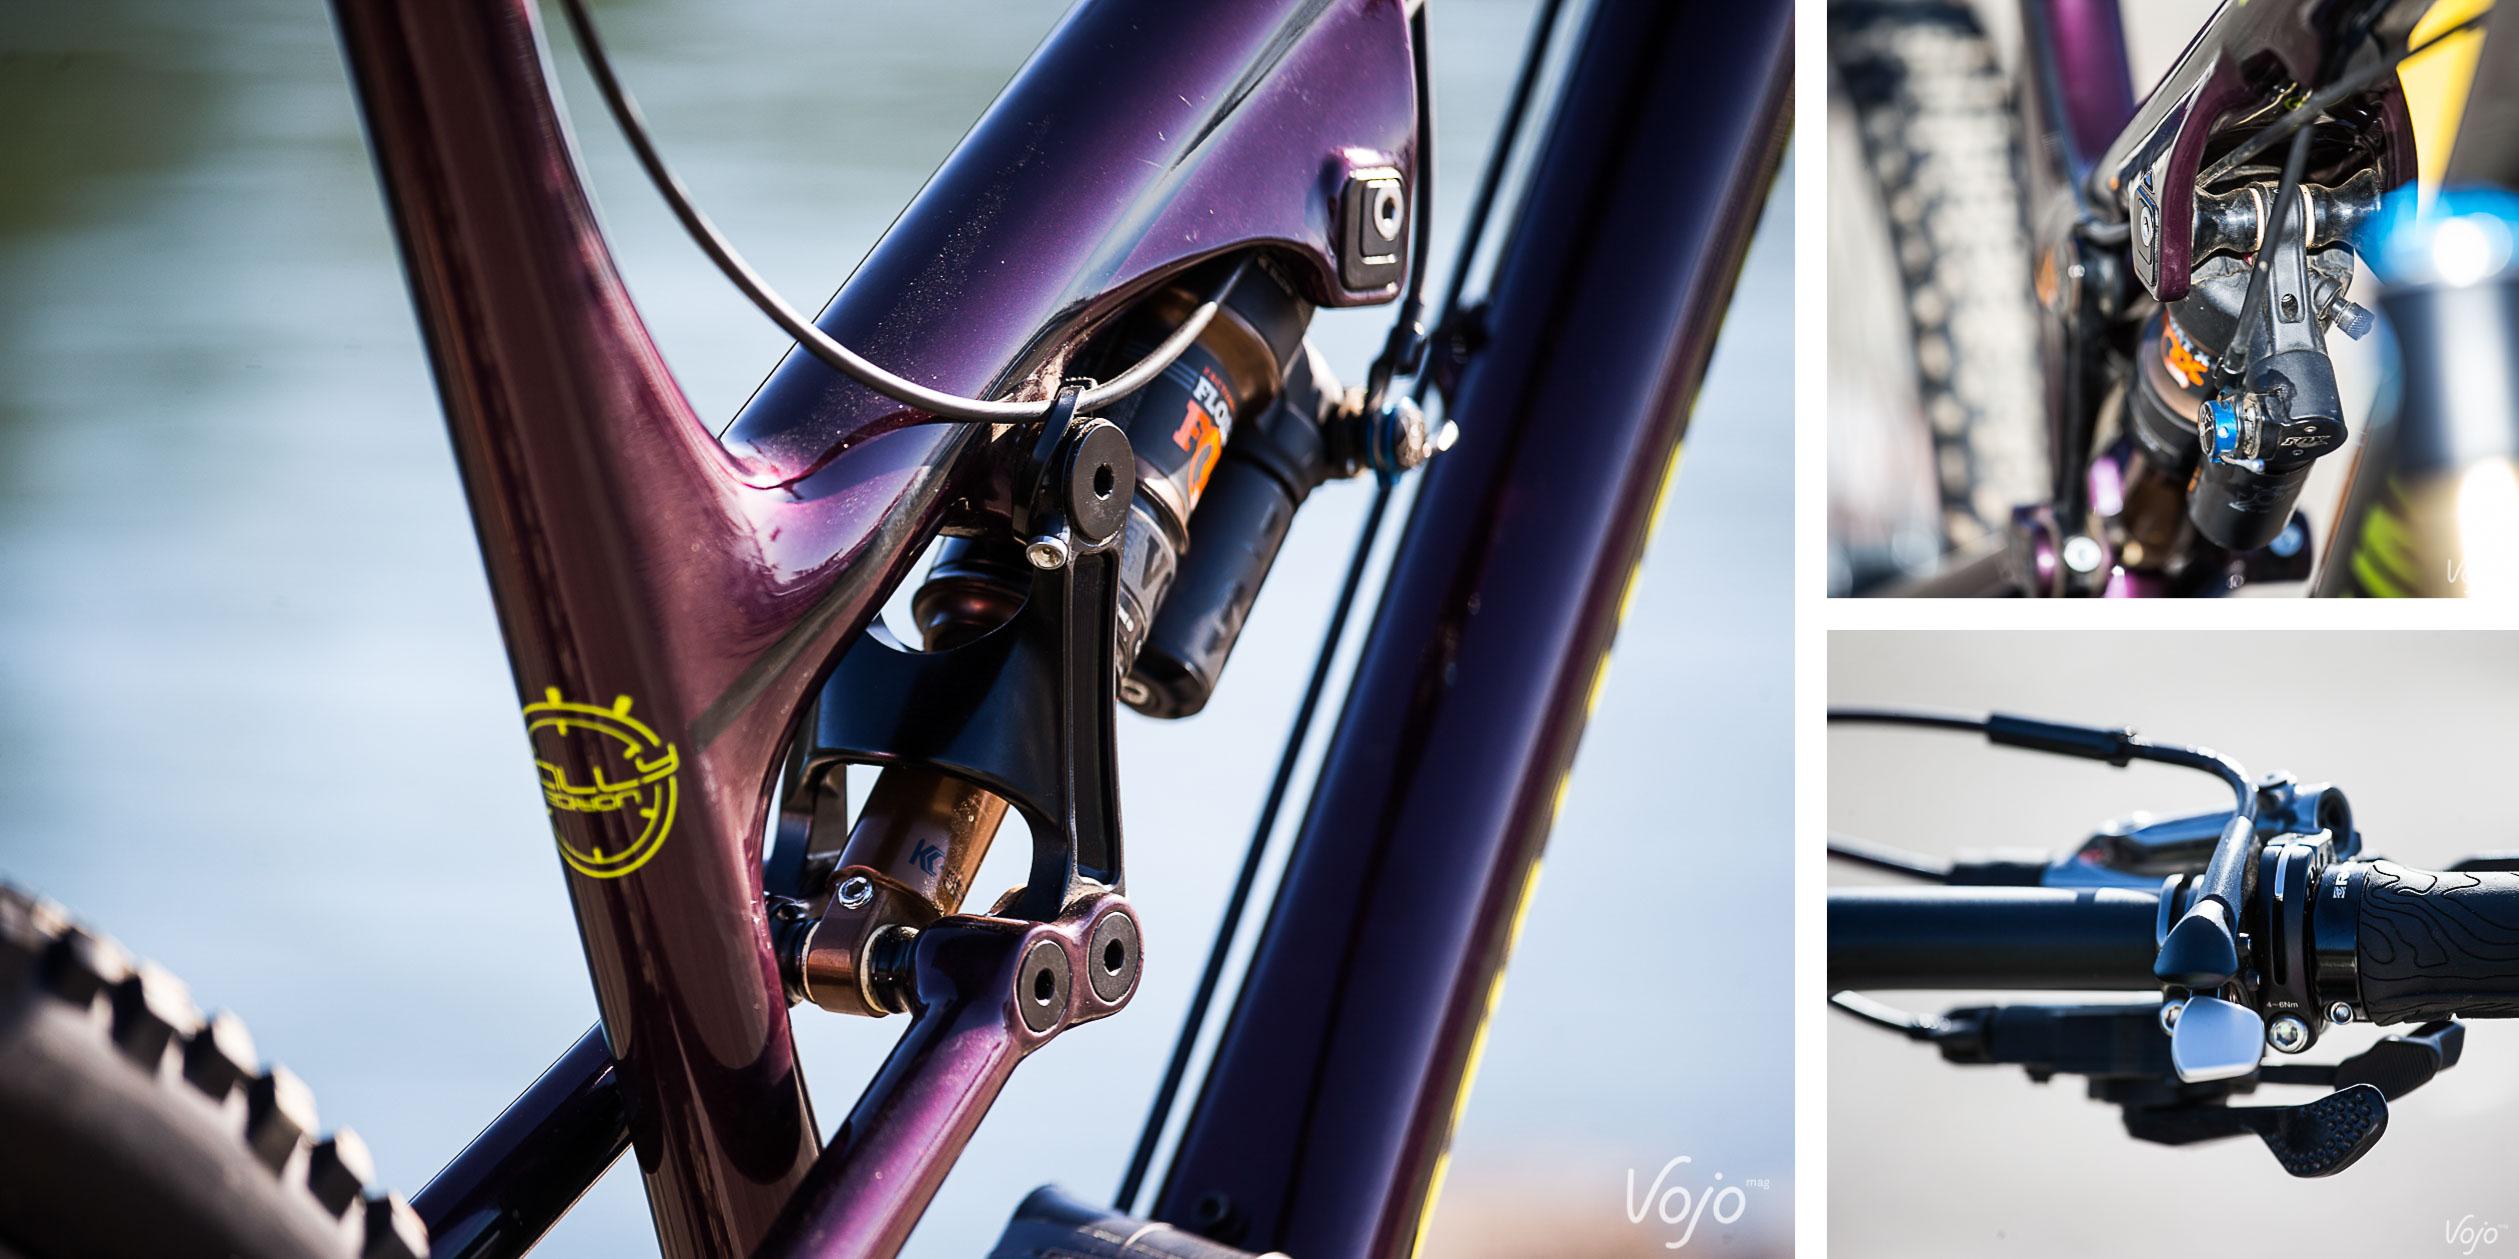 1-Florian_Nicolai_Rocky_Mountain_Altitude_Bikecheck_Copyright_OBeart_VojoMag-1